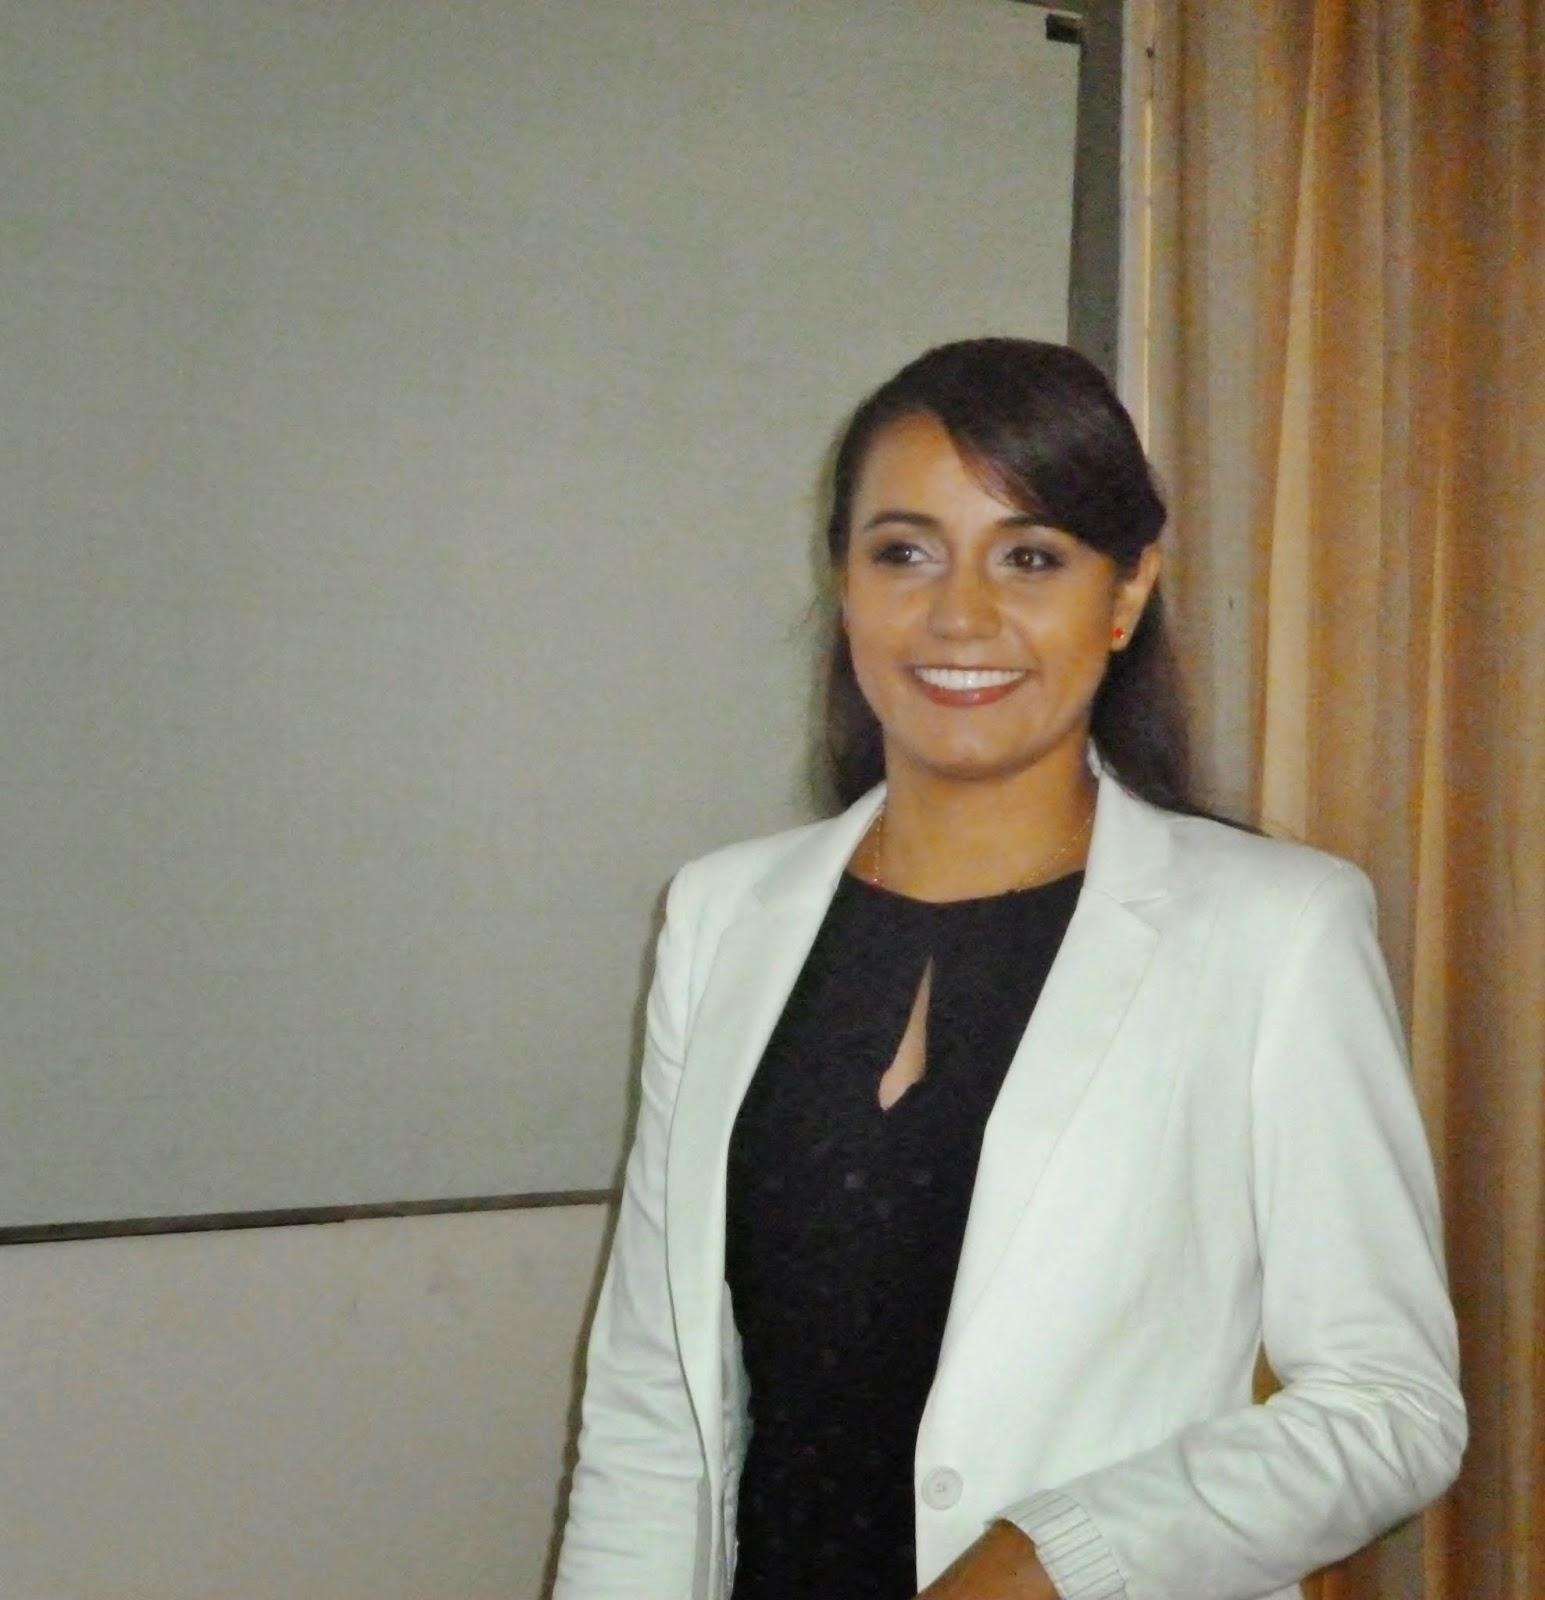 Phd. Valentina Gutiérrez